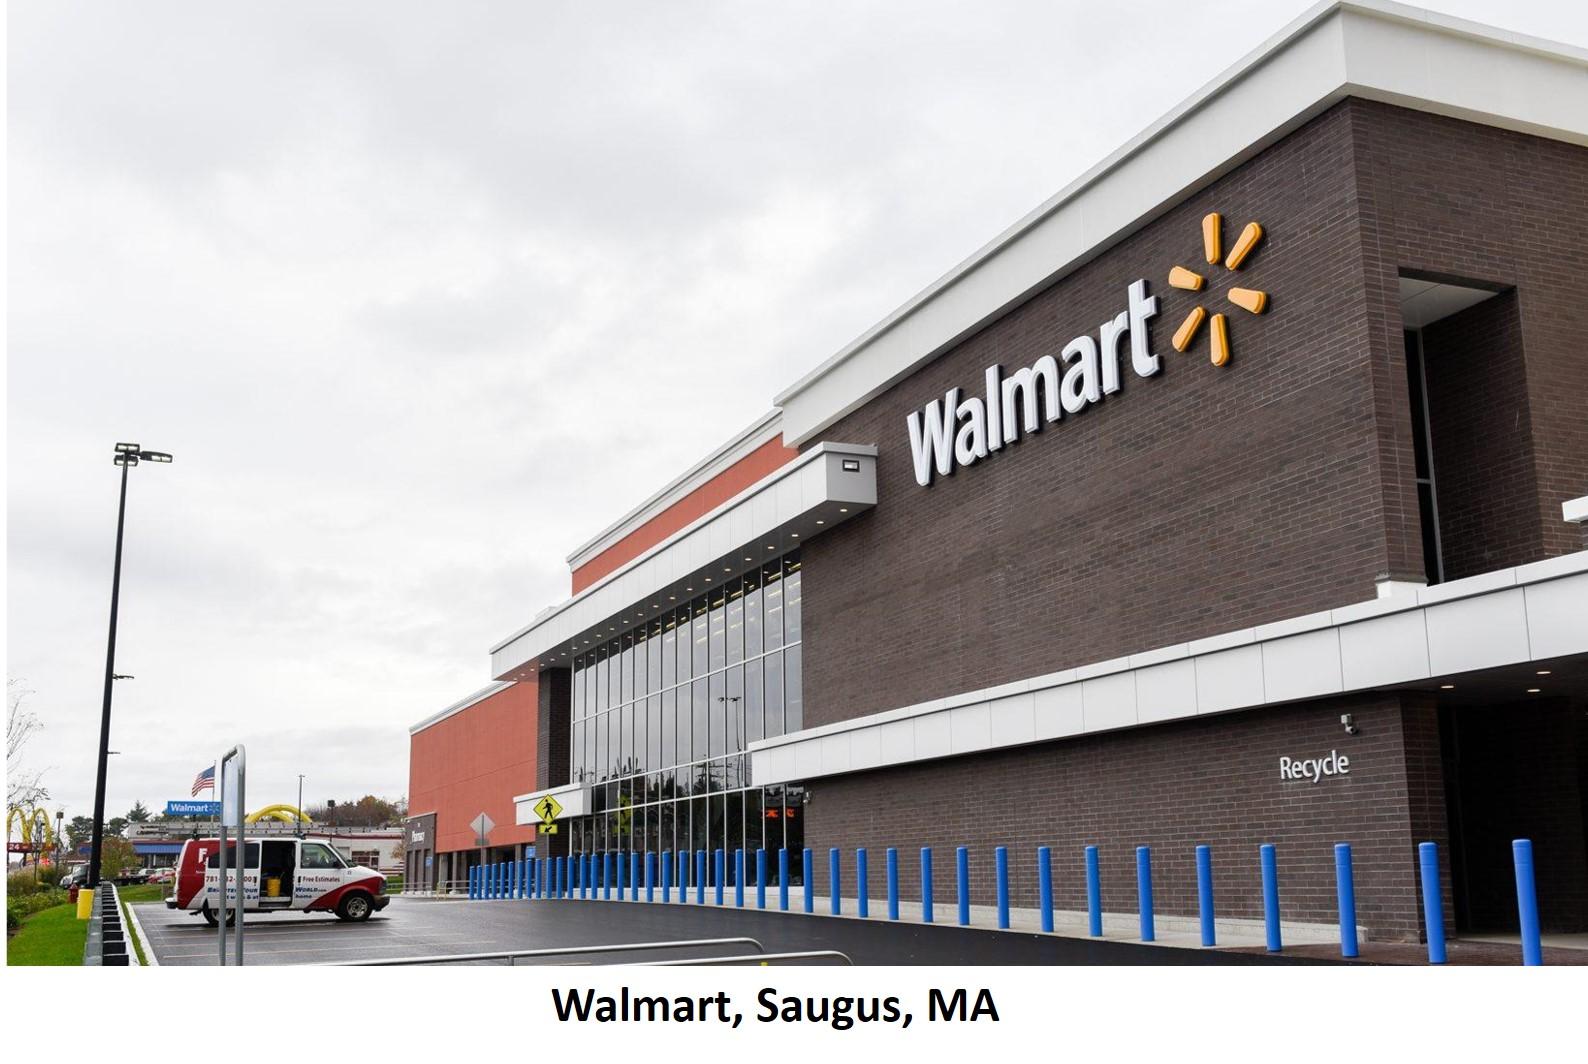 Walmart Saugus MA